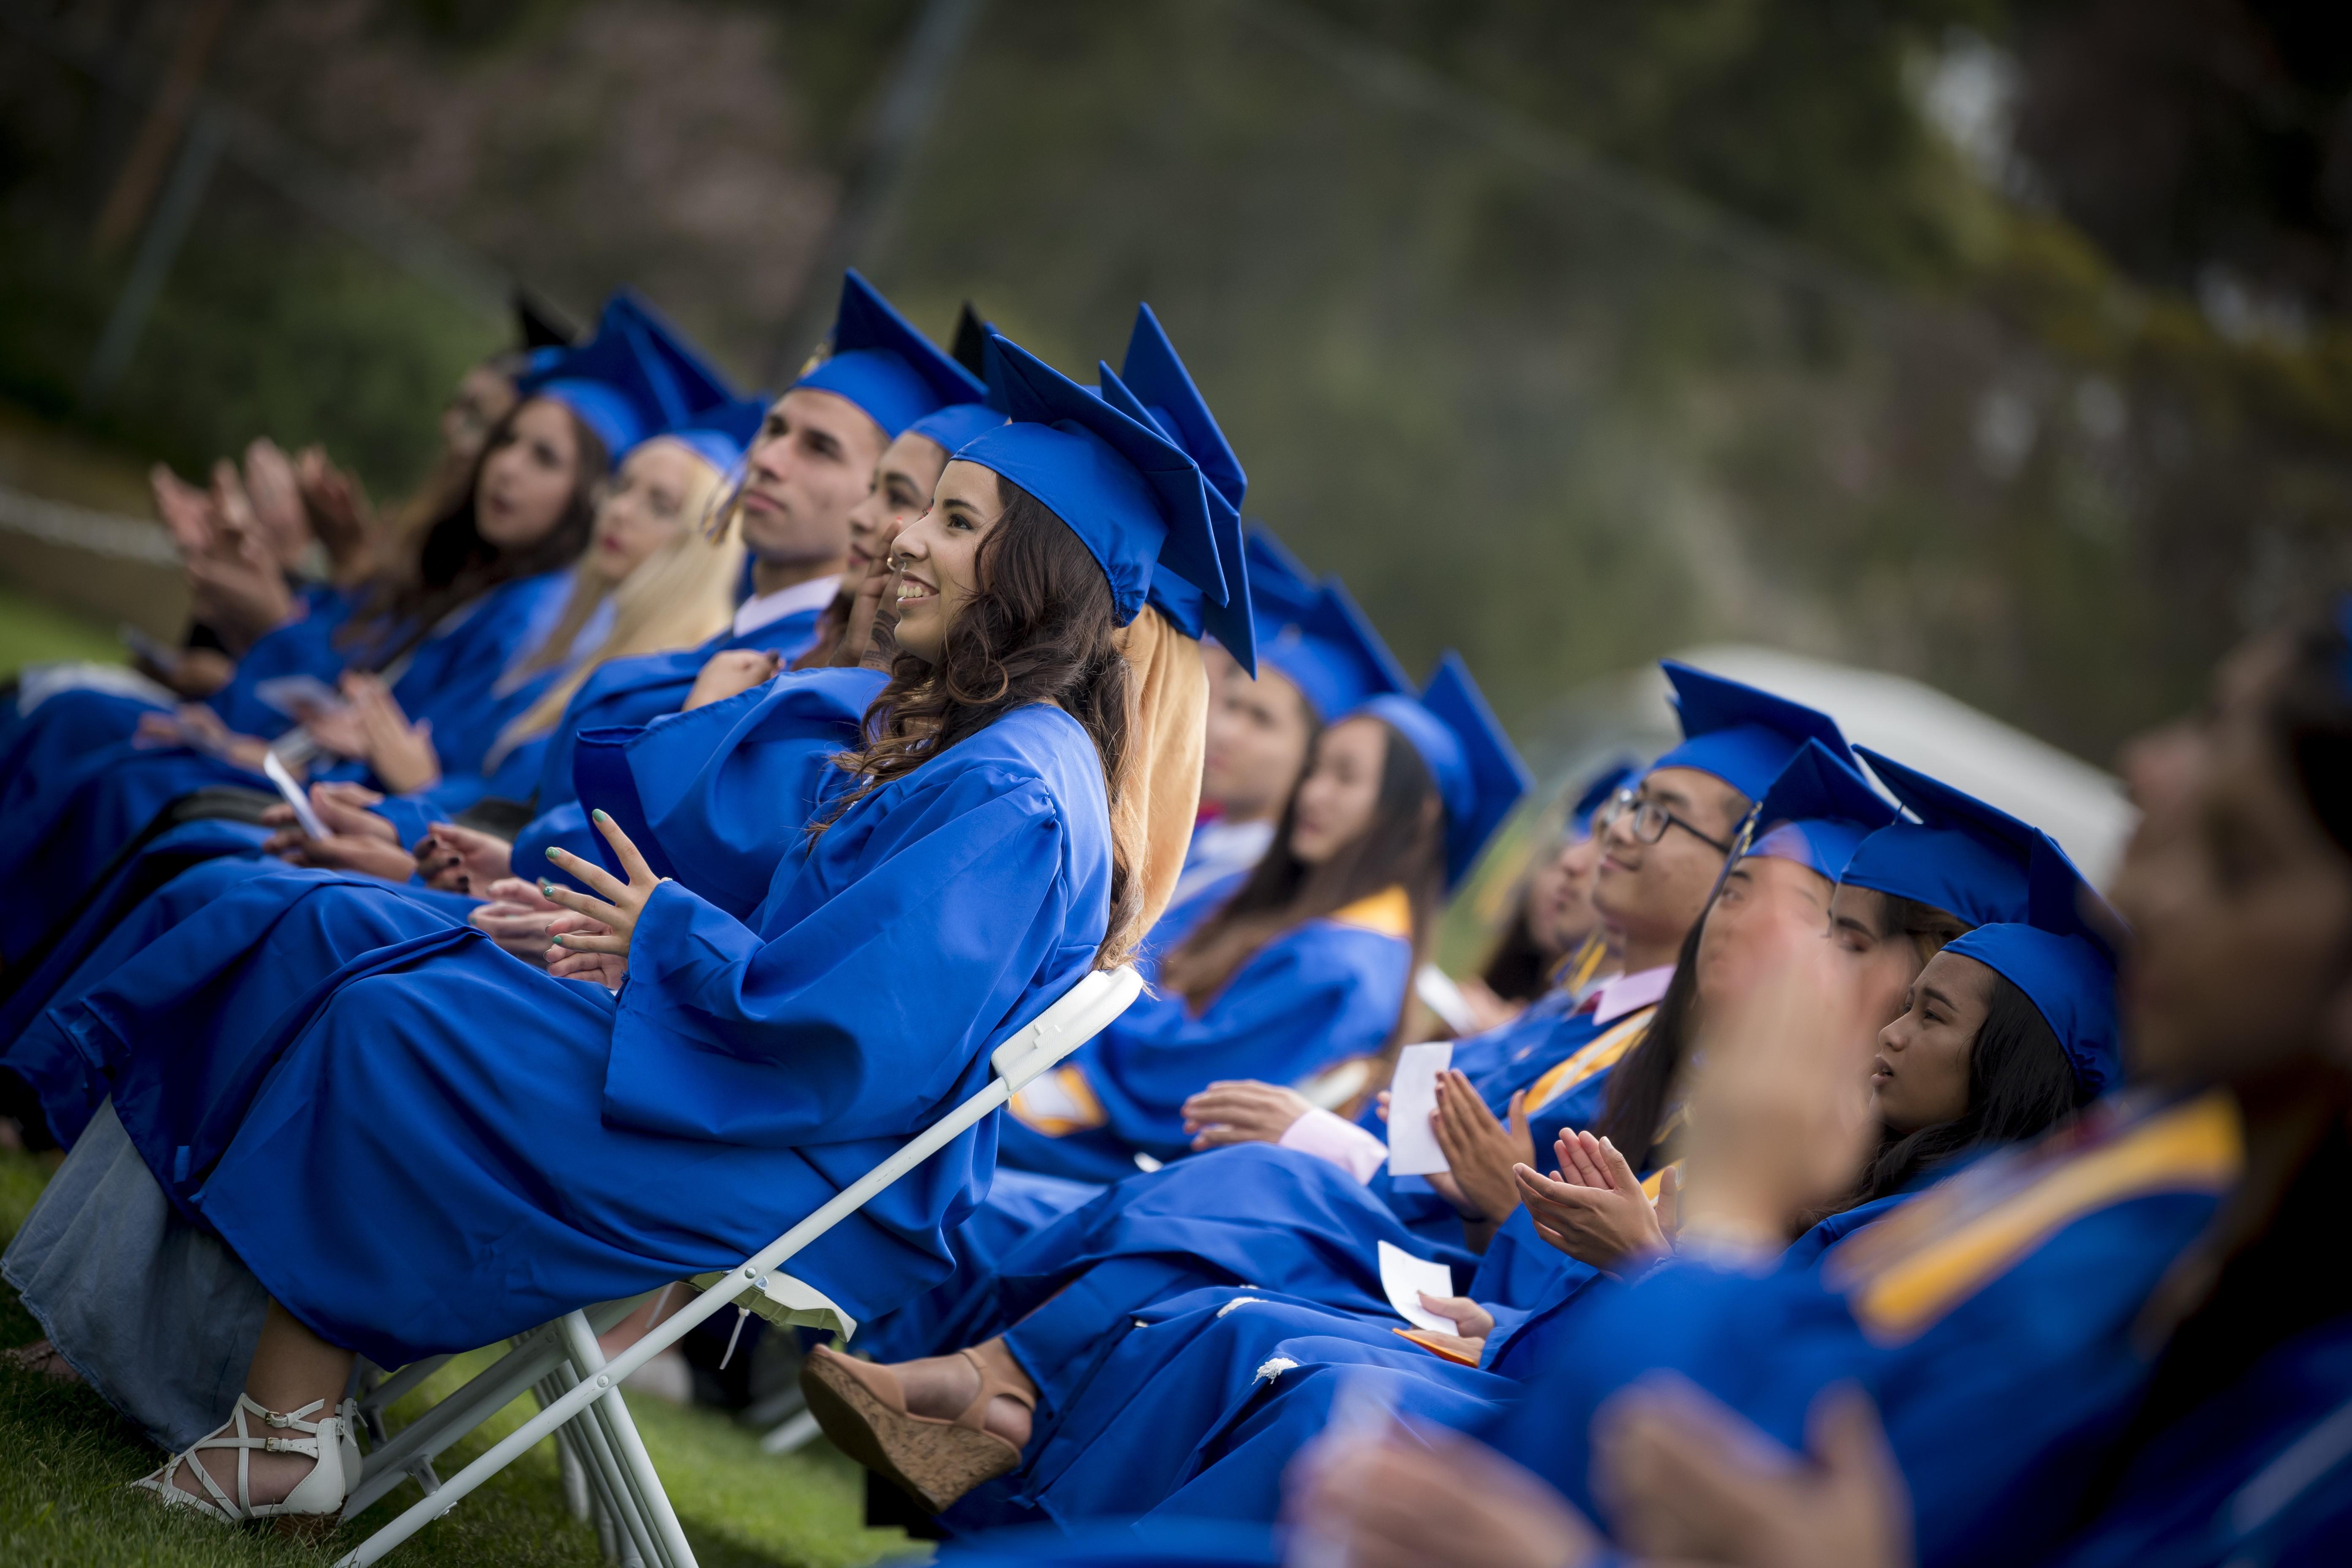 The Preuss School UC San Diego | LinkedIn